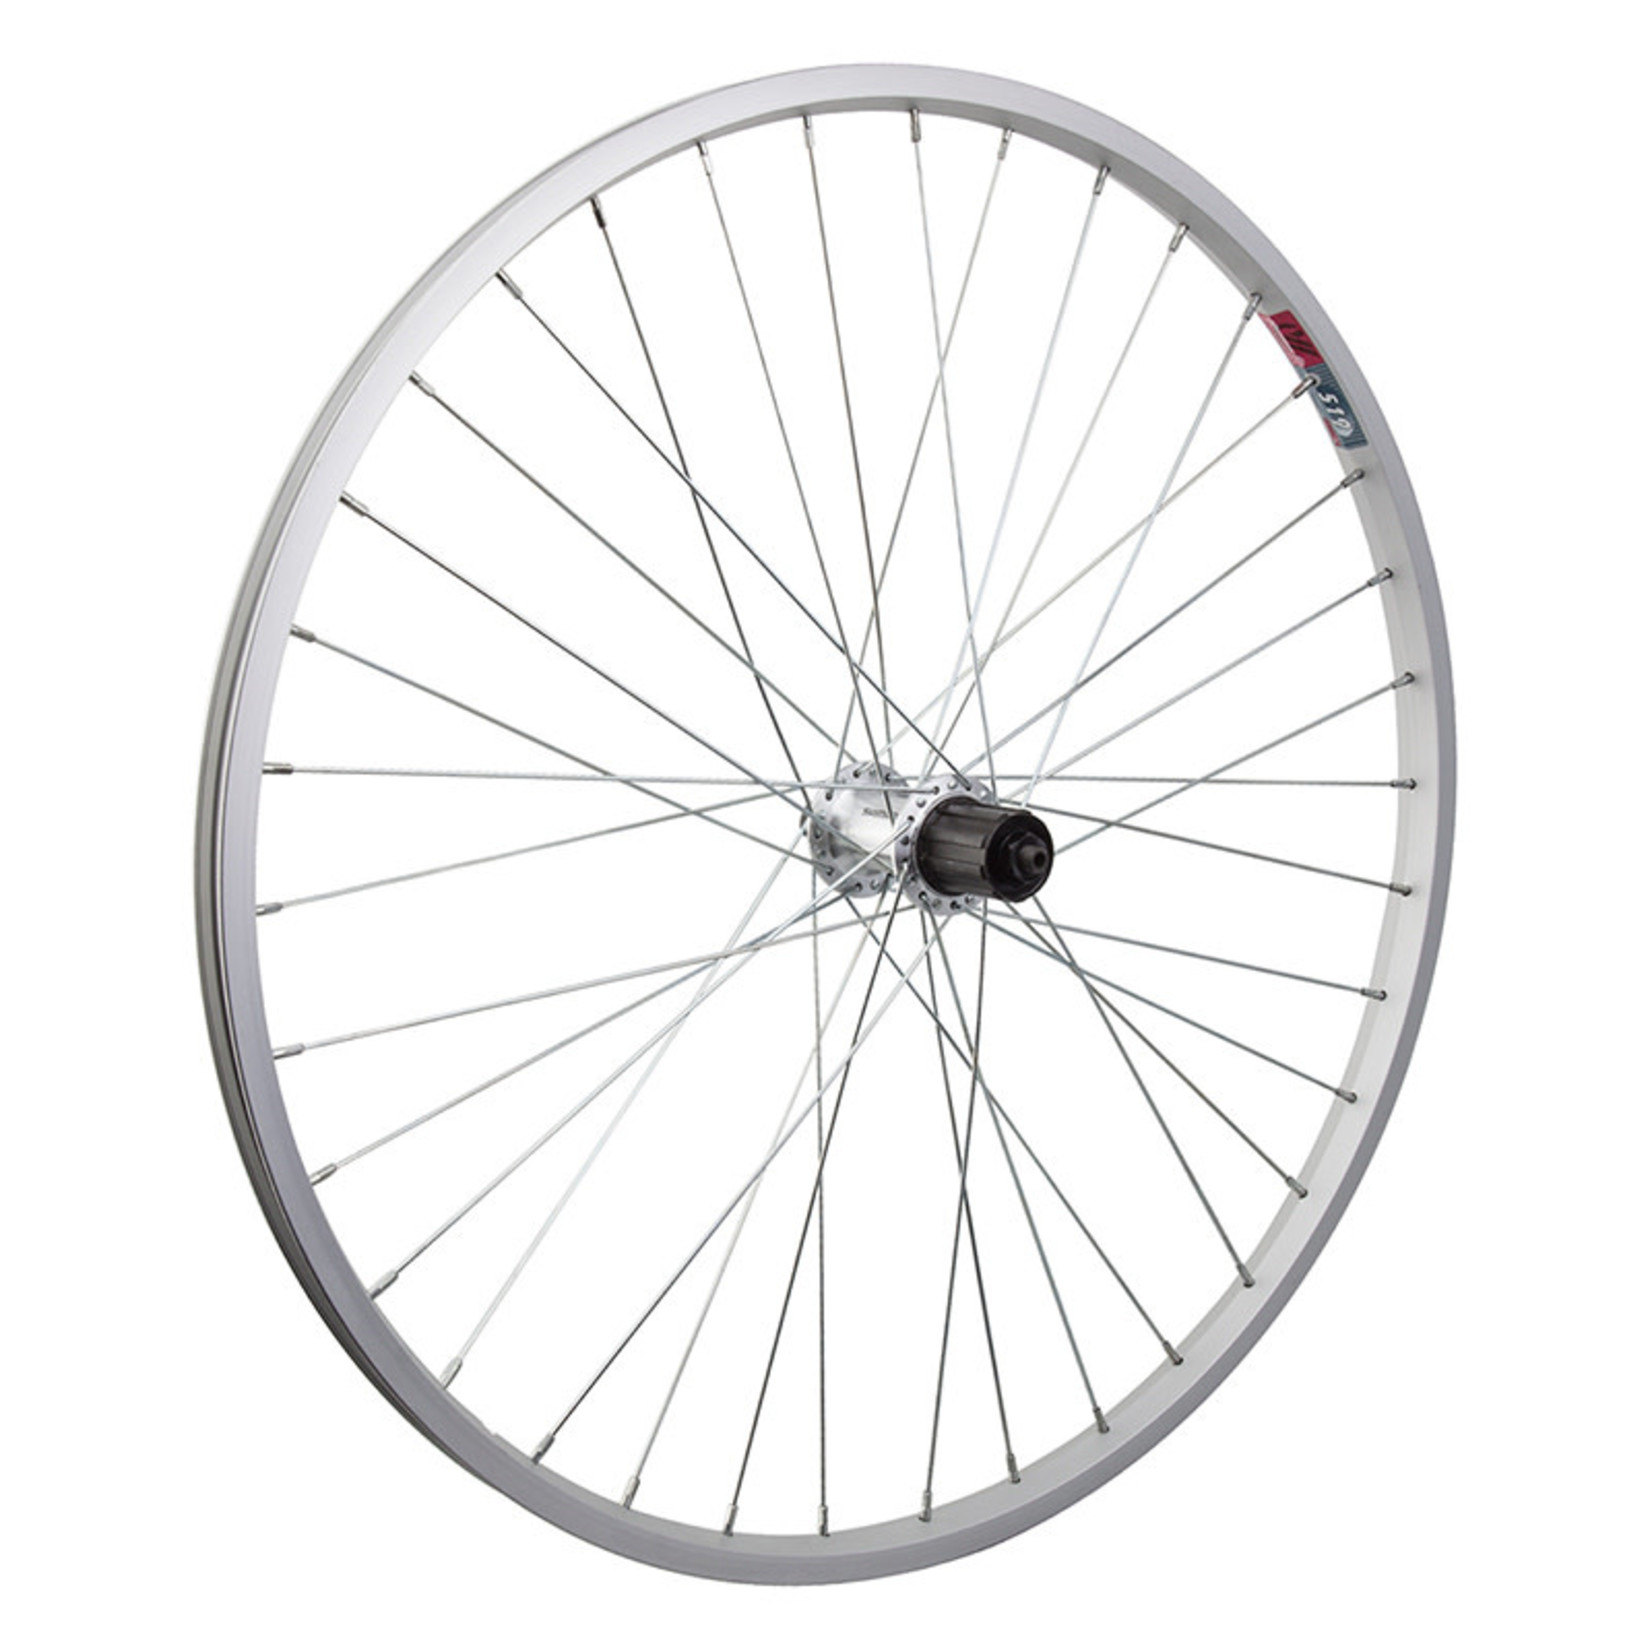 "26"" Rear Wheel Alloy Mountain Single Wall 8-10s Cass. 135mm 14g Silver"